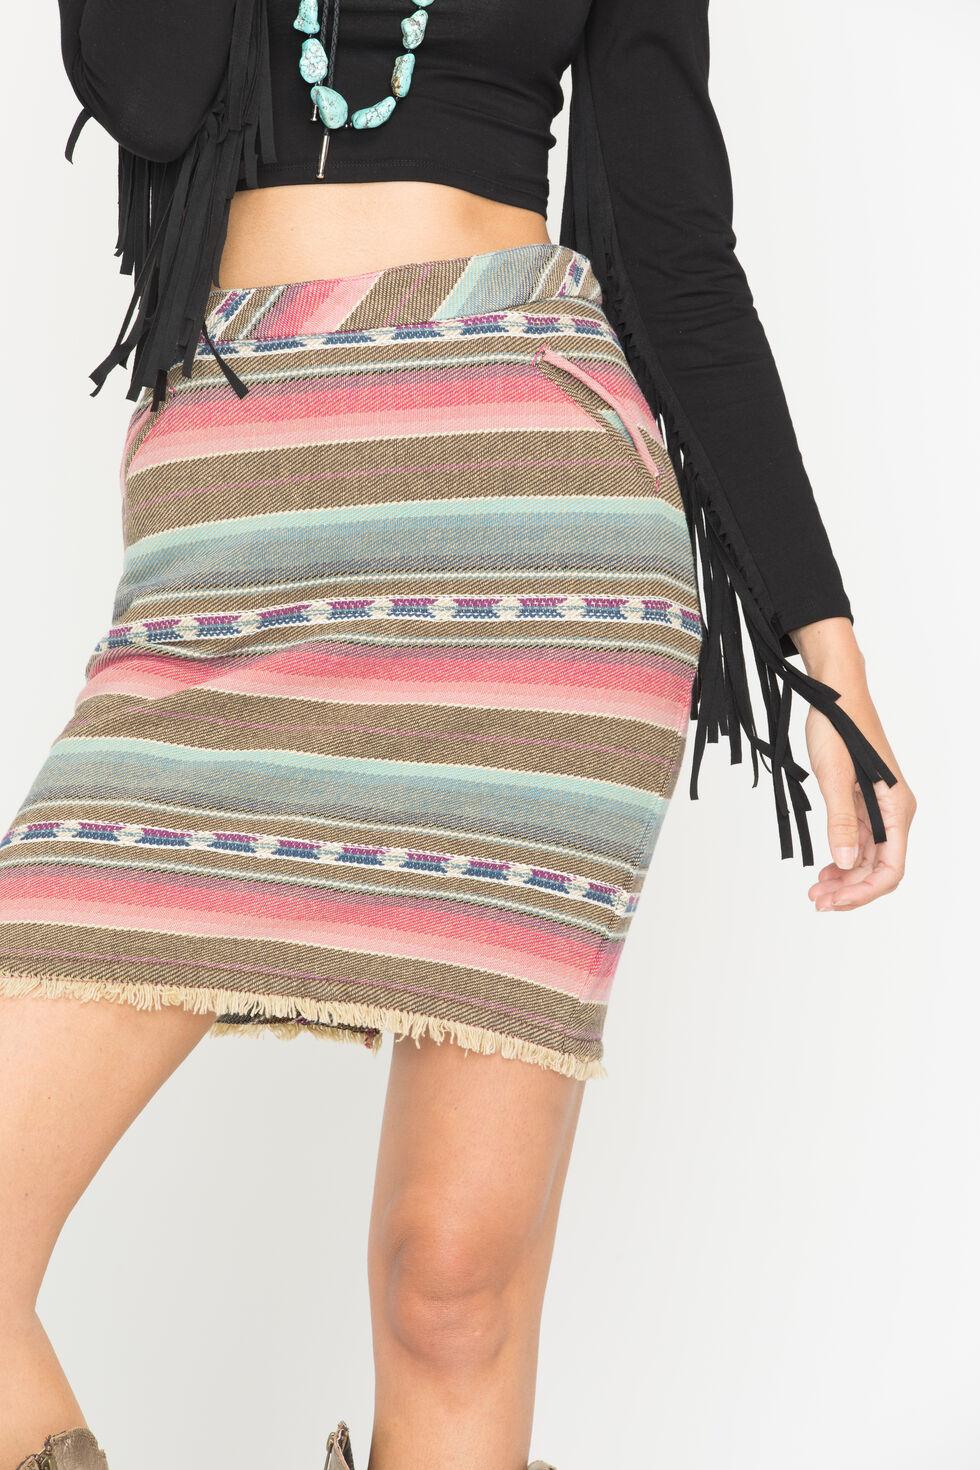 Ryan Michael Women's Stripe Jacquard Skirt, Raspberry, hi-res